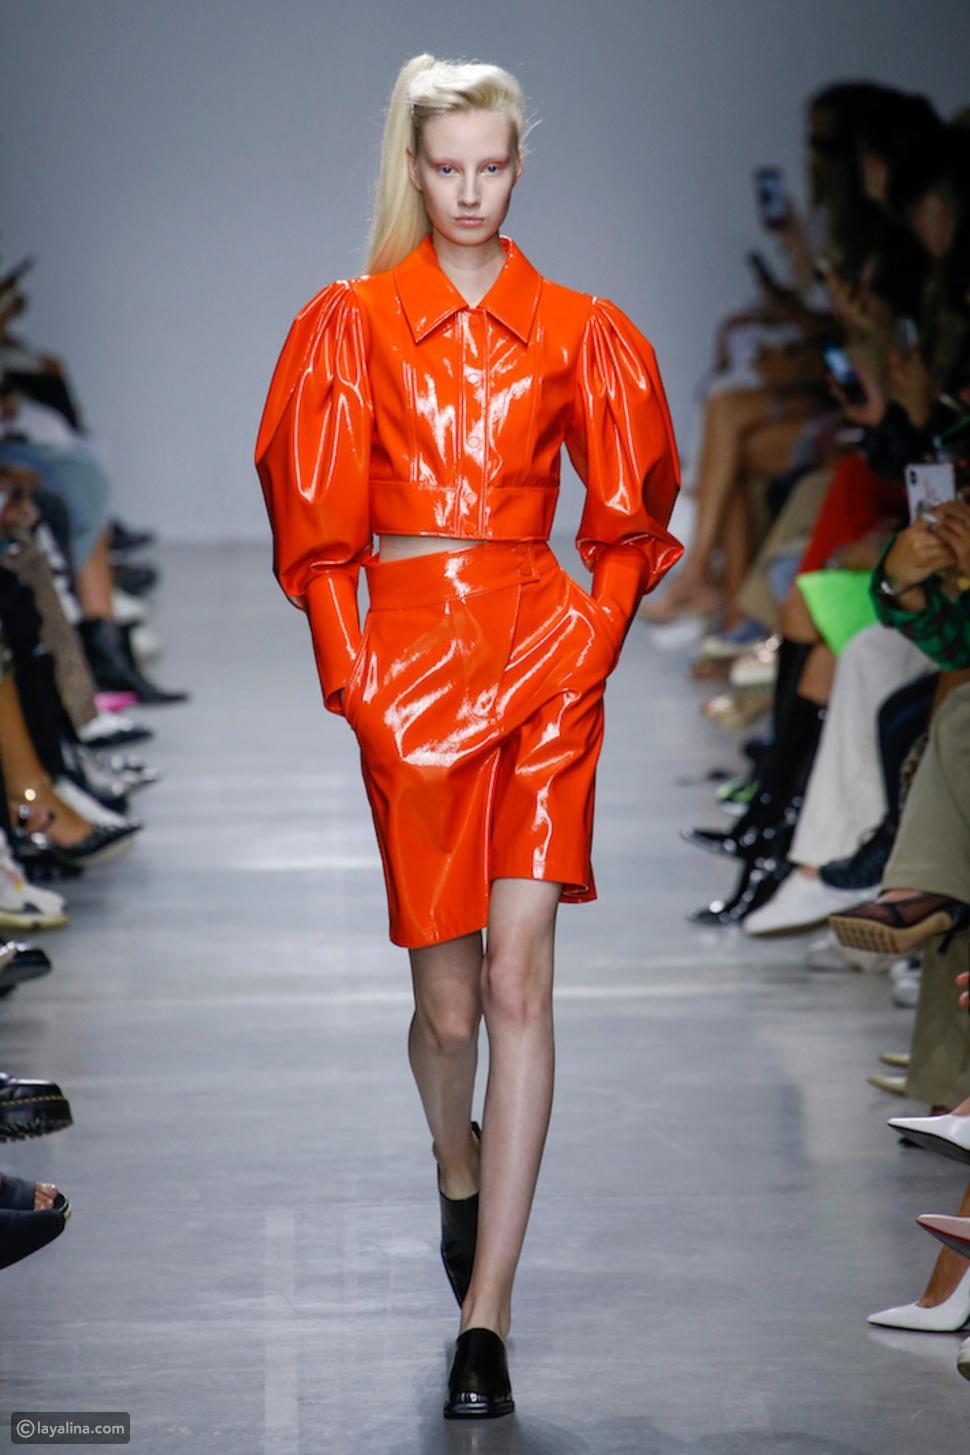 الجلود الملونةColorful Leather